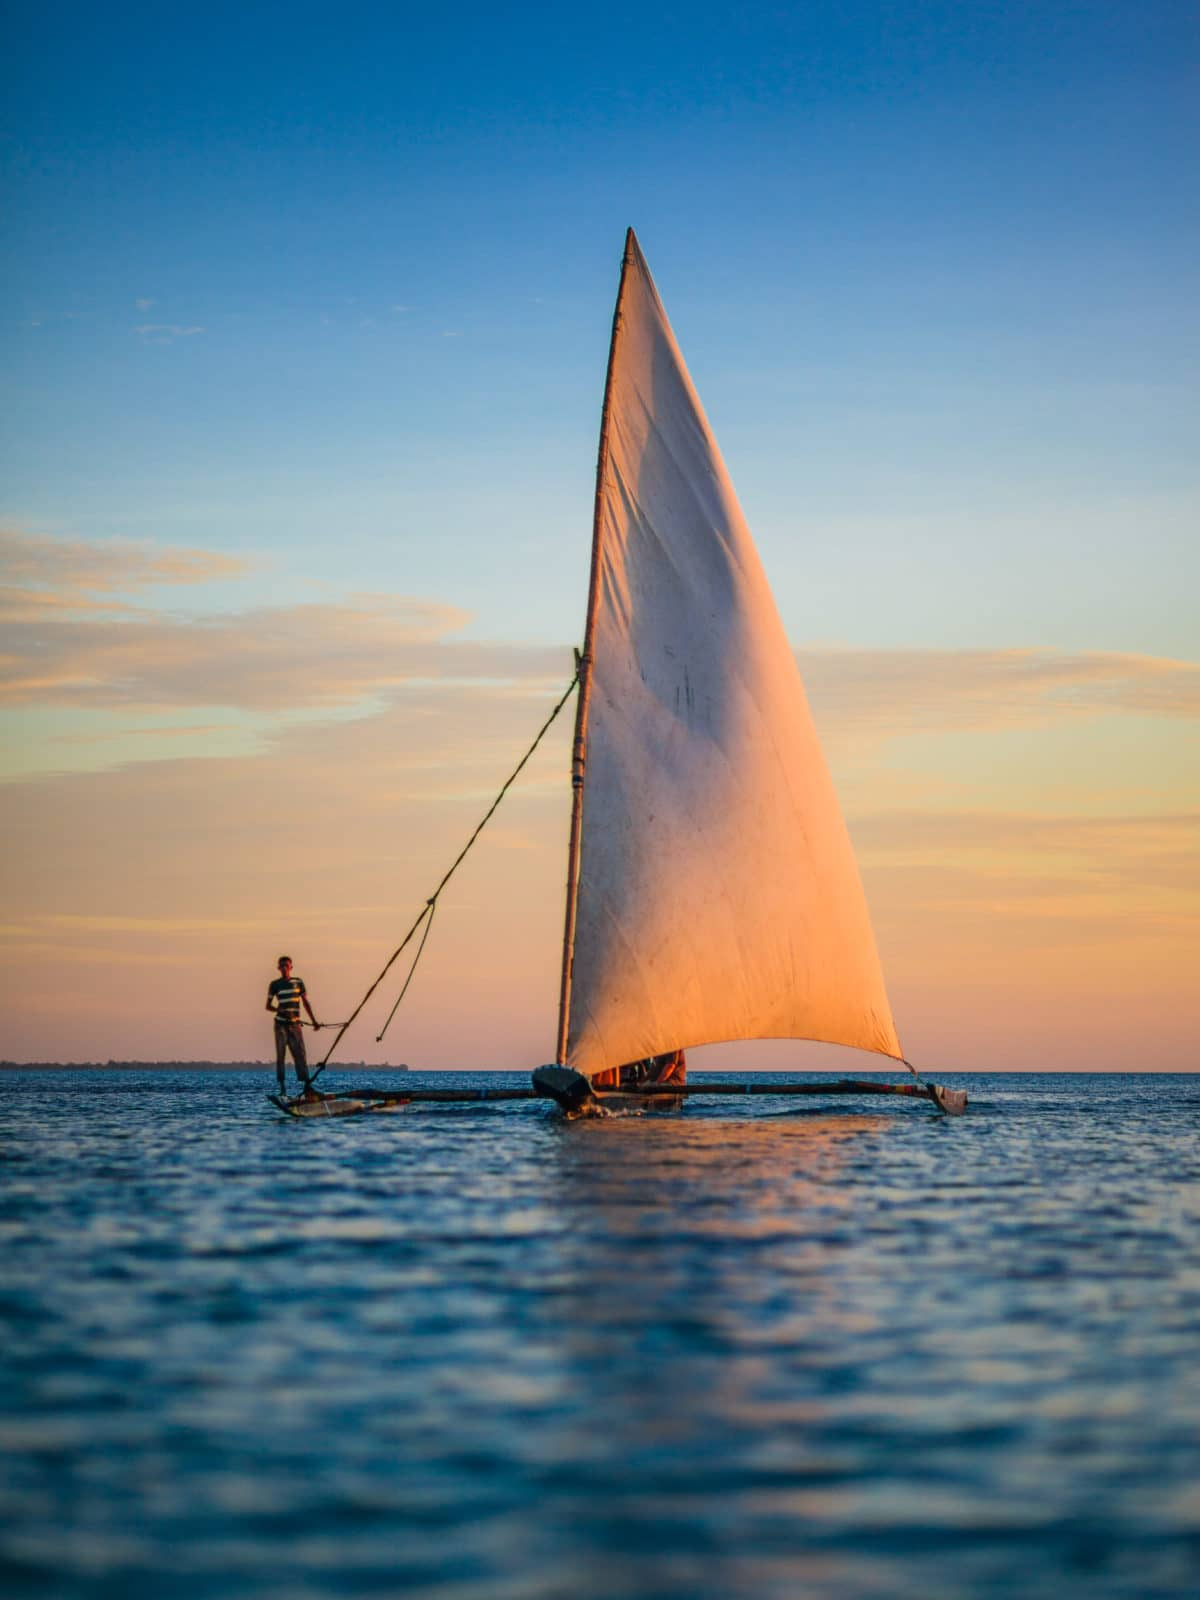 Anhede-Zanzibar - anhede-3-extras-5.jpg